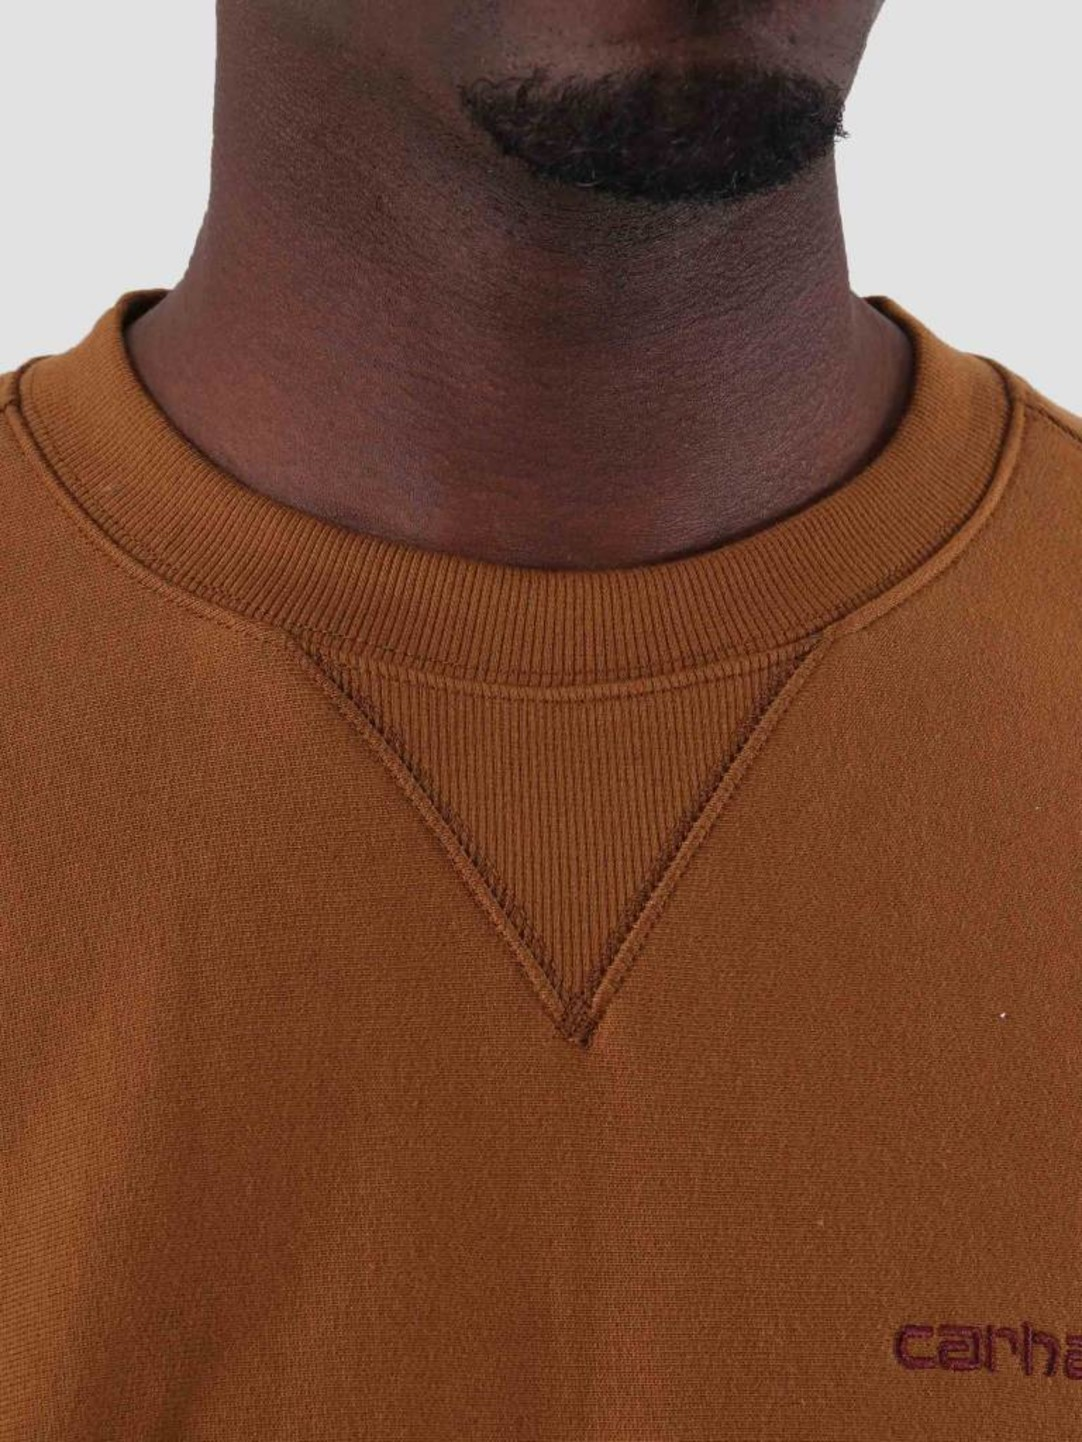 Carhartt WIP Carhartt WIP American Script Sweat Hamilton Brown I025475-HZ00